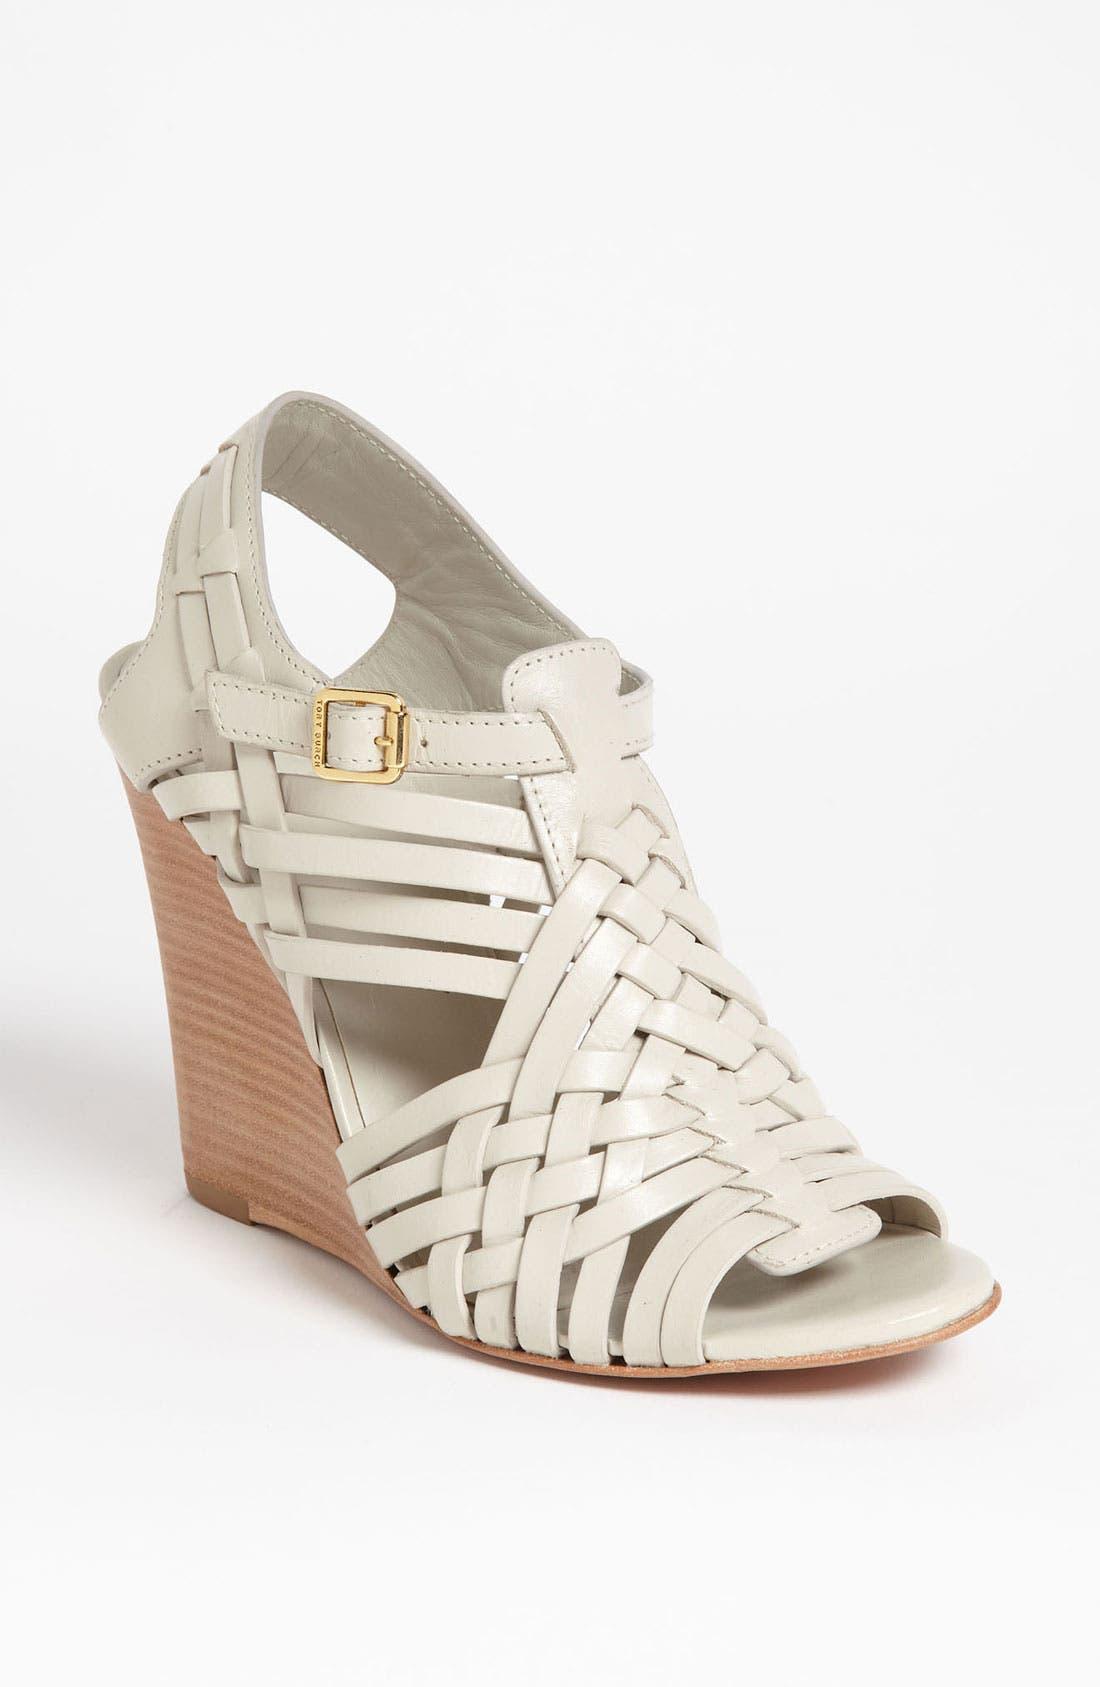 Alternate Image 1 Selected - Tory Burch 'Nadia' Wedge Sandal